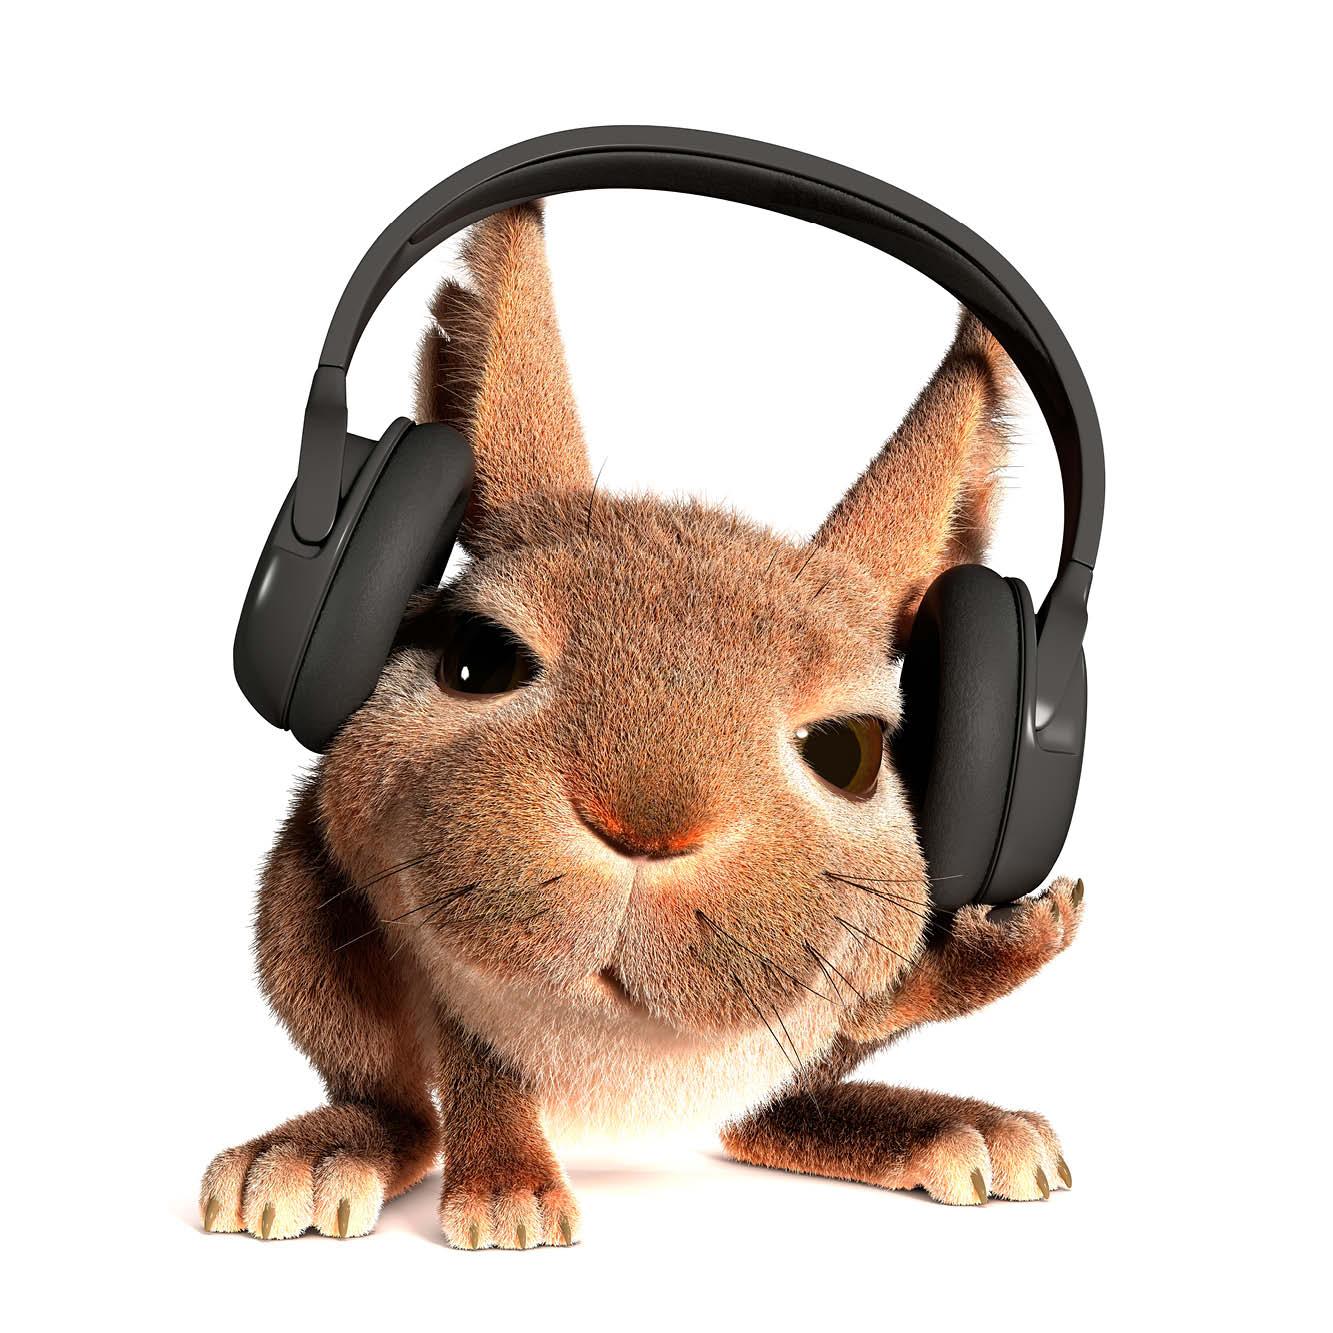 Rabbit in headphones v2